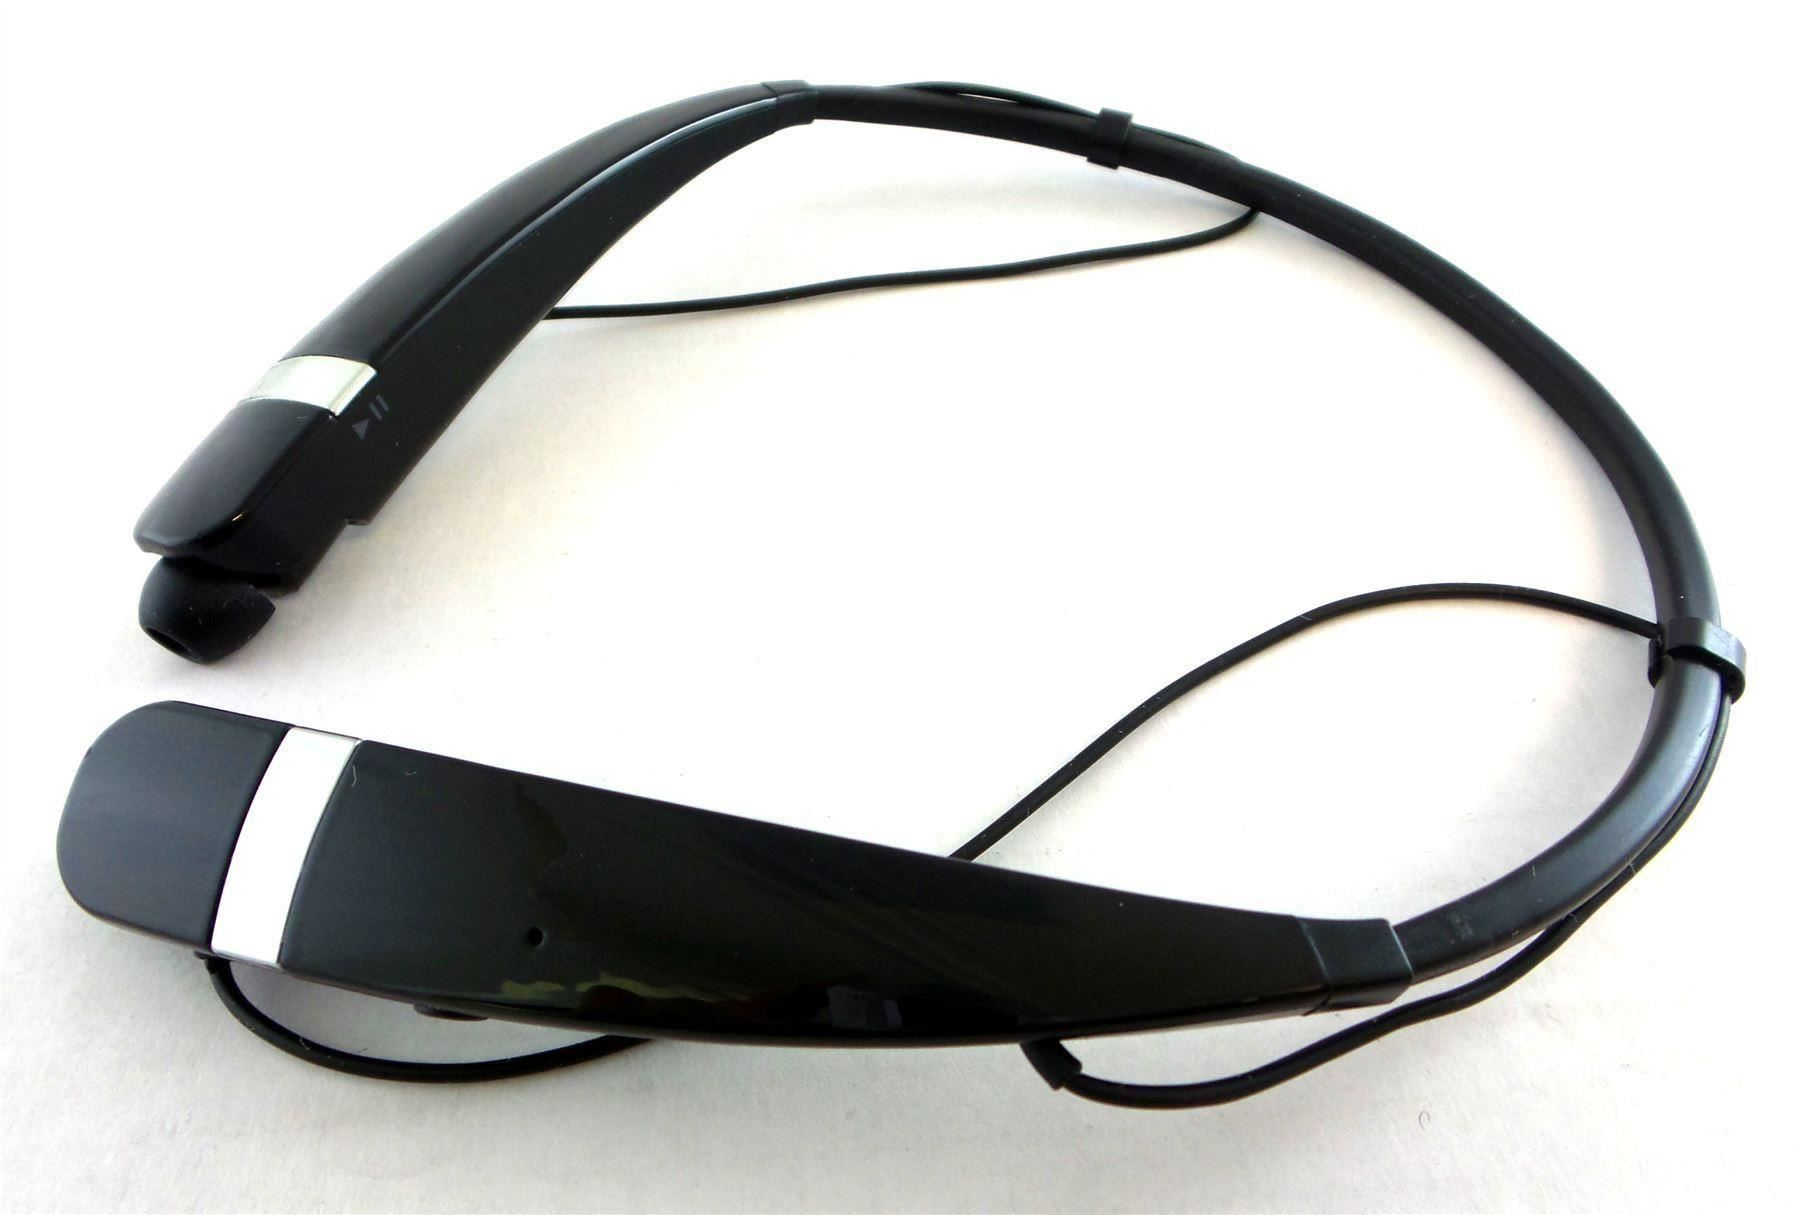 lg tone pro hbs 760 headphones wireless bluetooth stereo. Black Bedroom Furniture Sets. Home Design Ideas